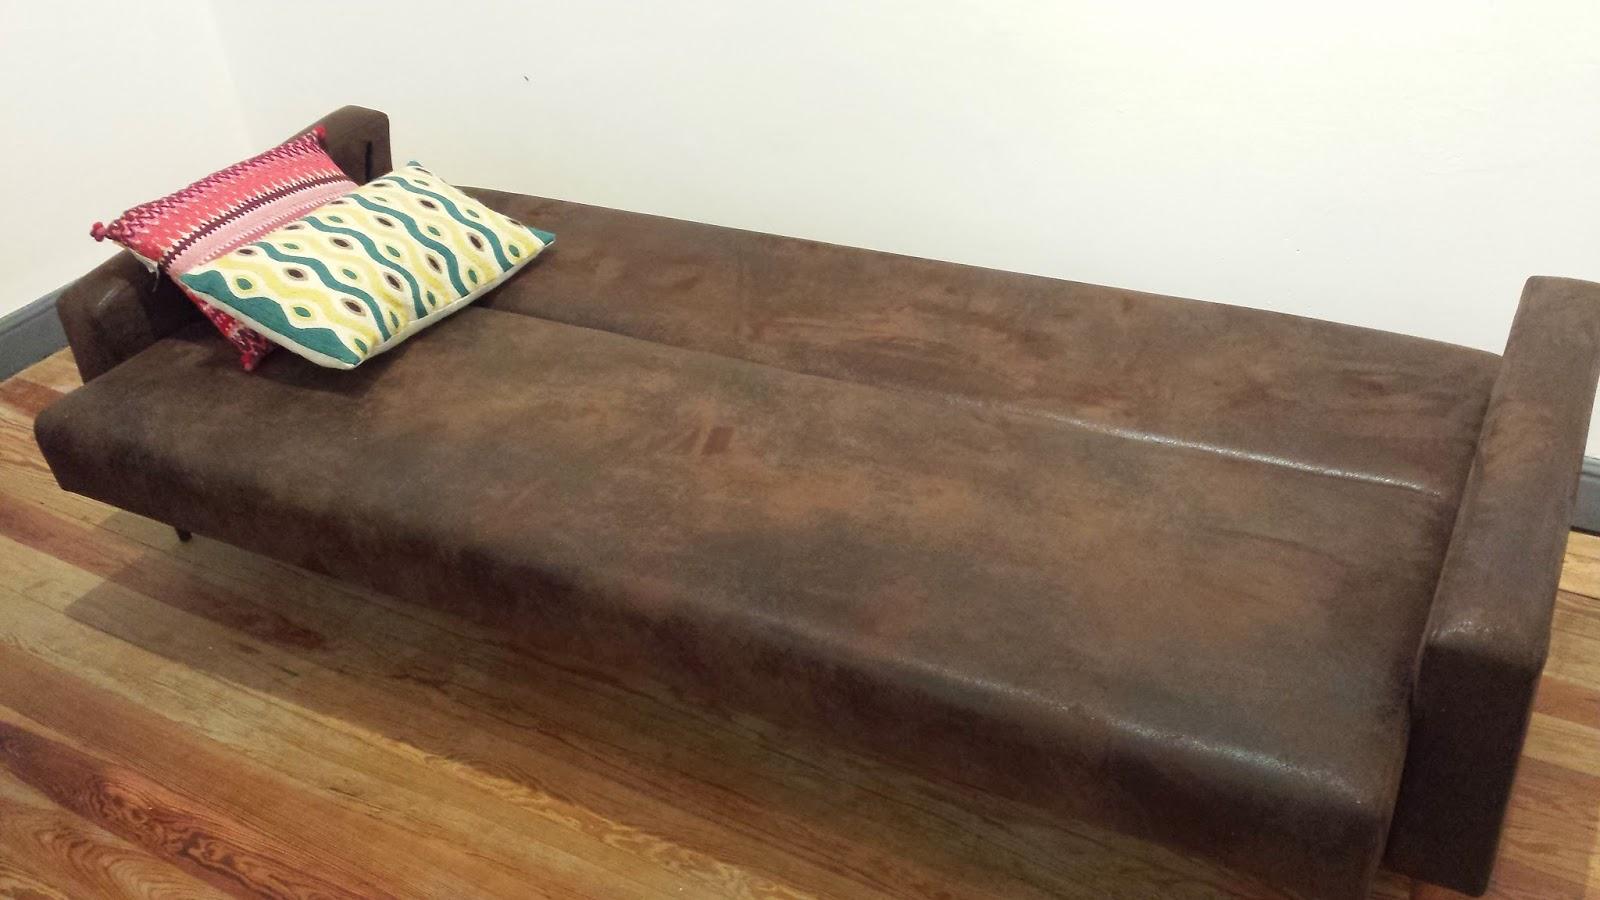 Olika cat logo olika 2014 los muebles retro de montevideo for Divanlito sofa cama